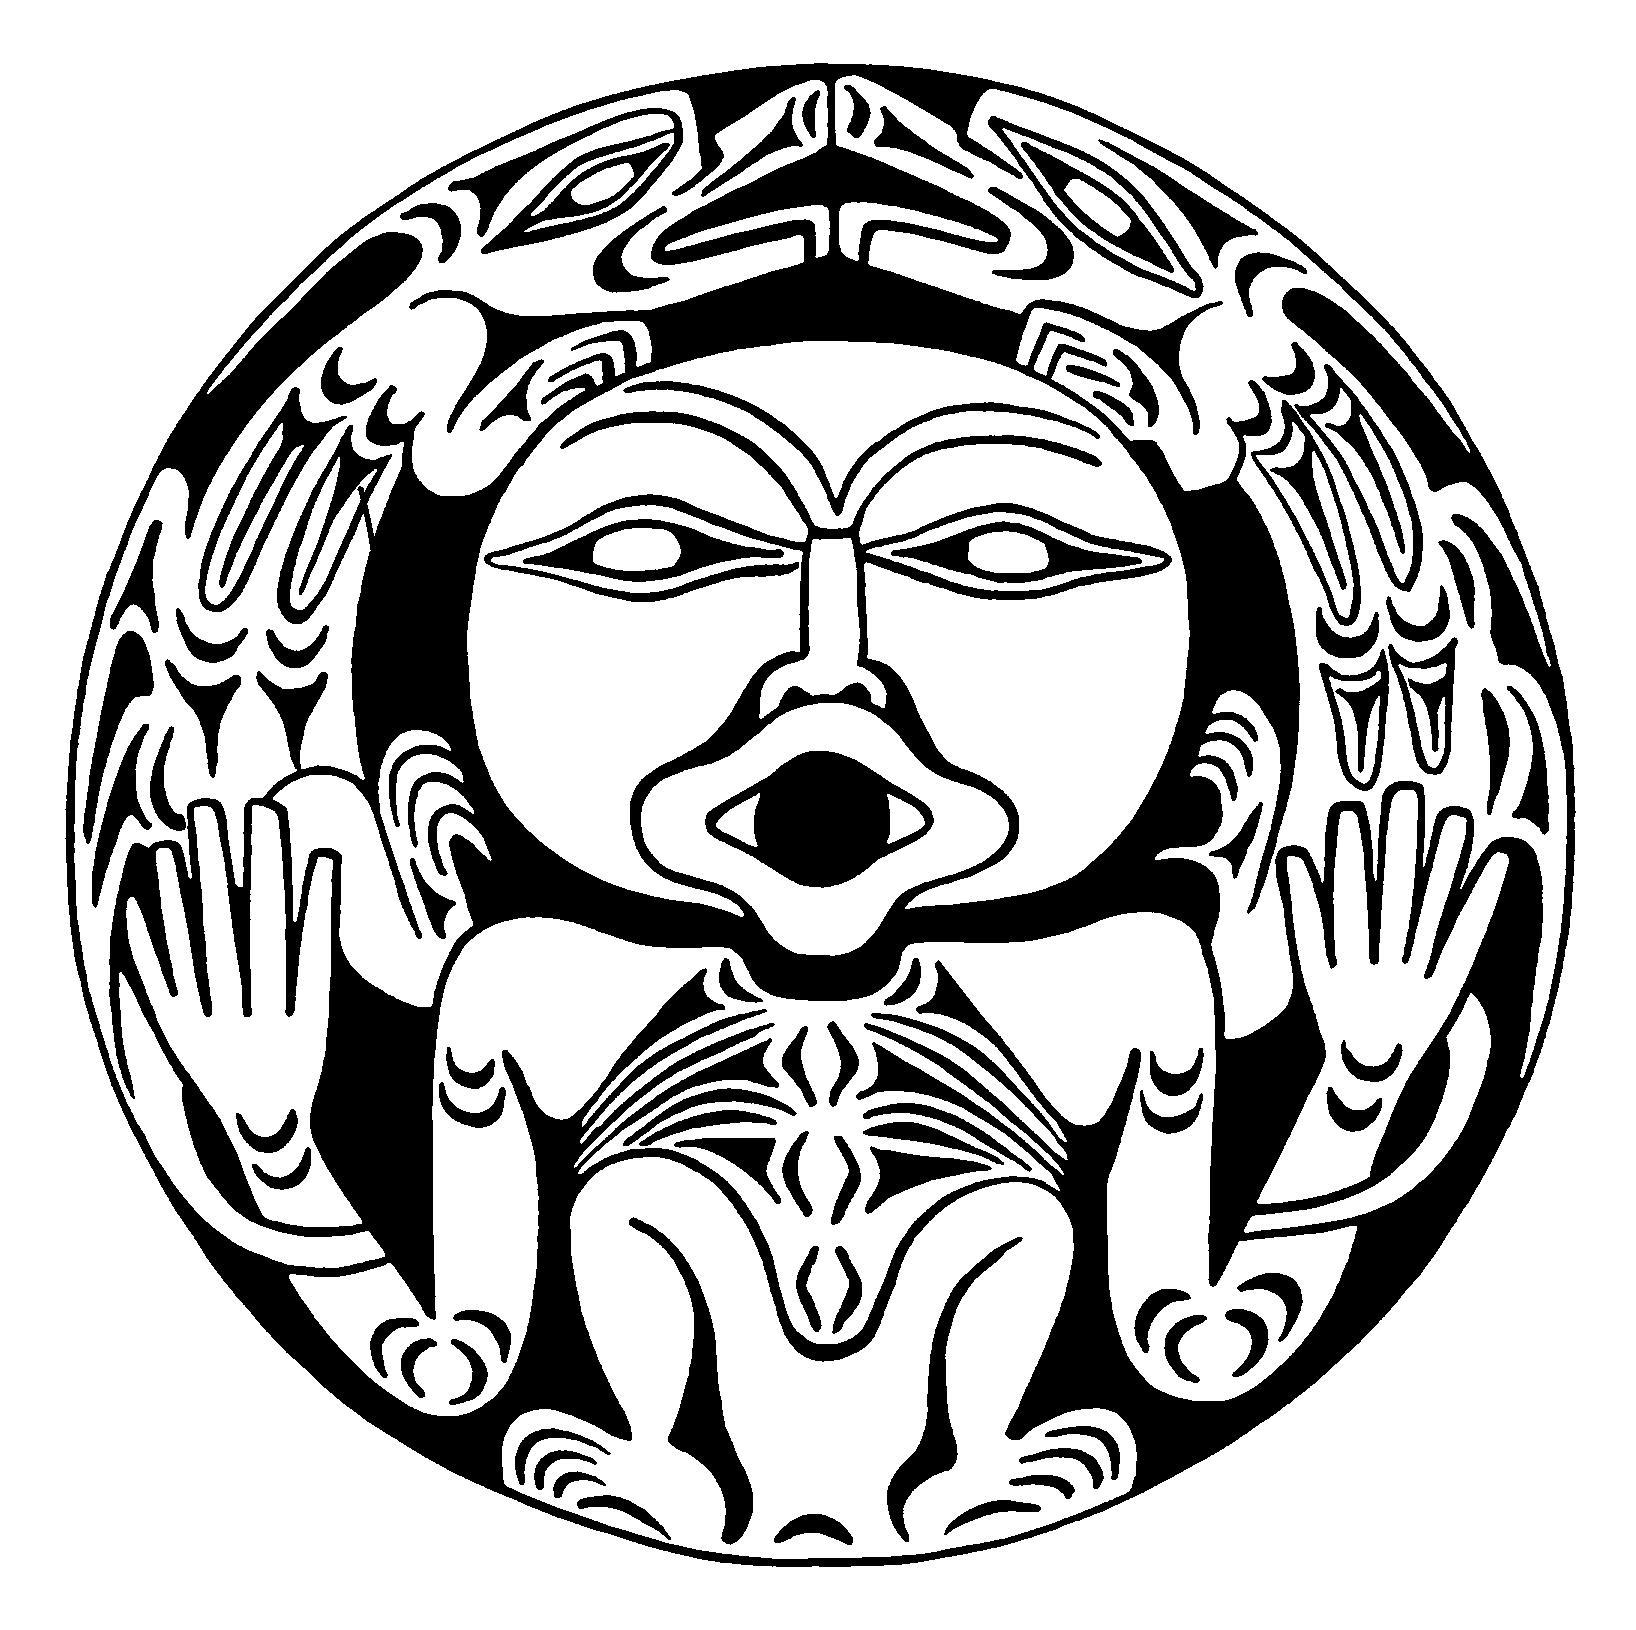 Art northwest coastal people creature in circle mohawk